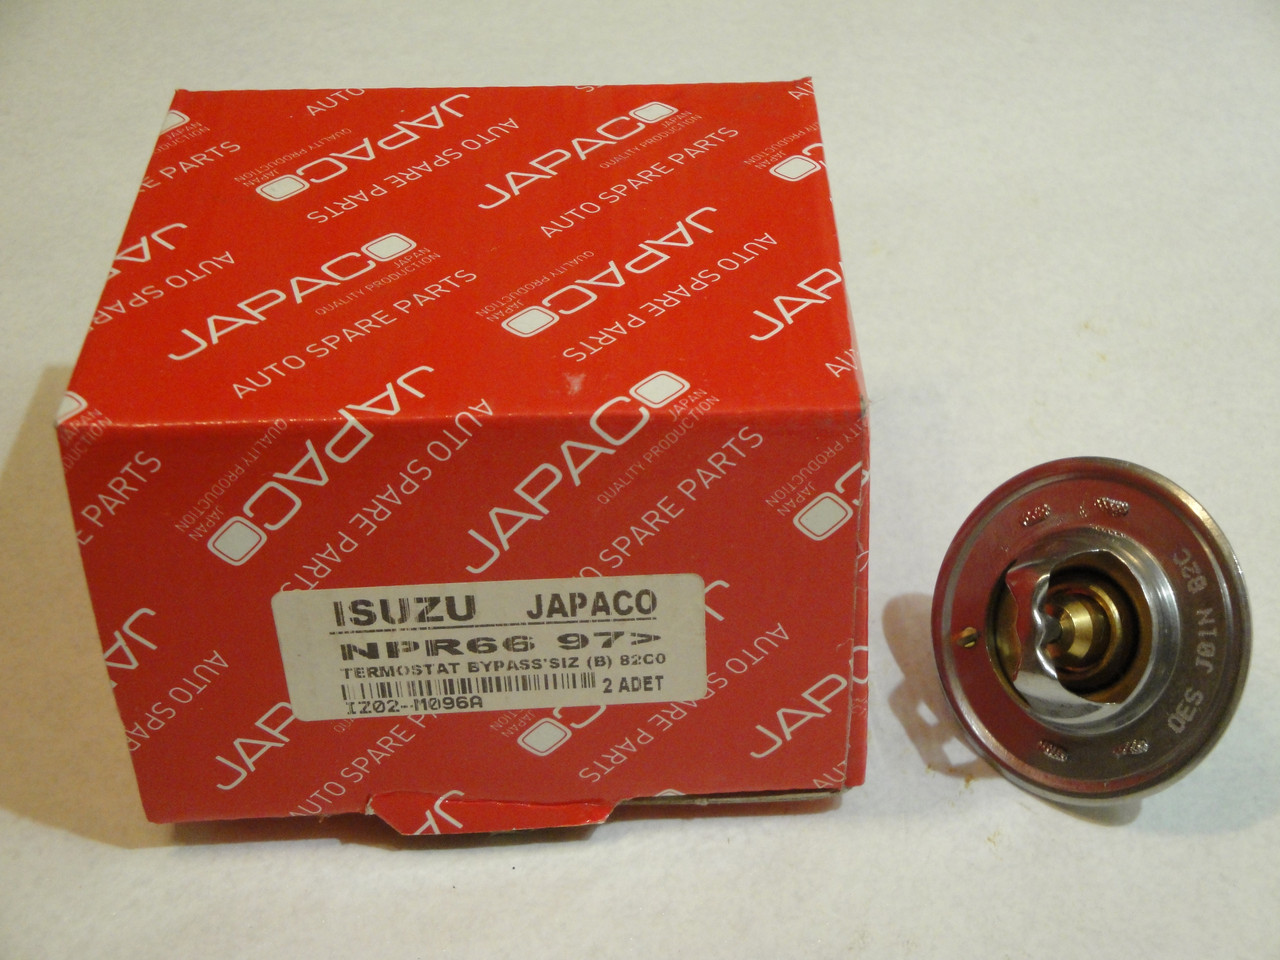 Термостат двигателя БОГДАН A091/A092 (ISUZU 4HF1/4HG1/4HG1T/4HE1T 82C) КОРОТКИЙ (8973007872/8970286902) JAPA